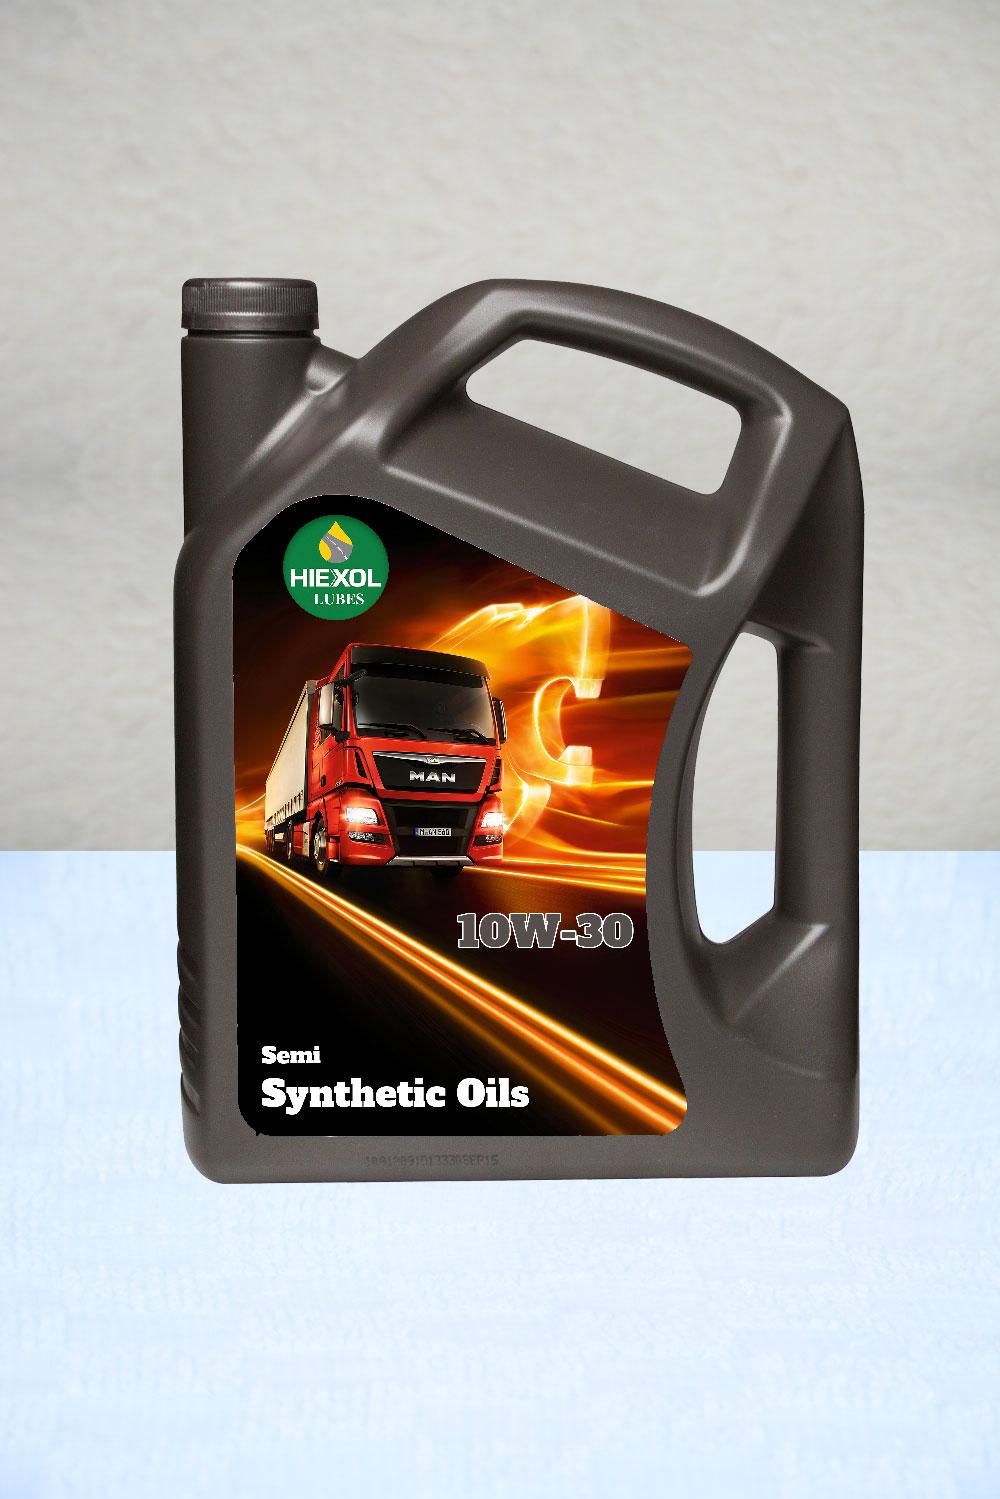 Semi Synthetic Oils